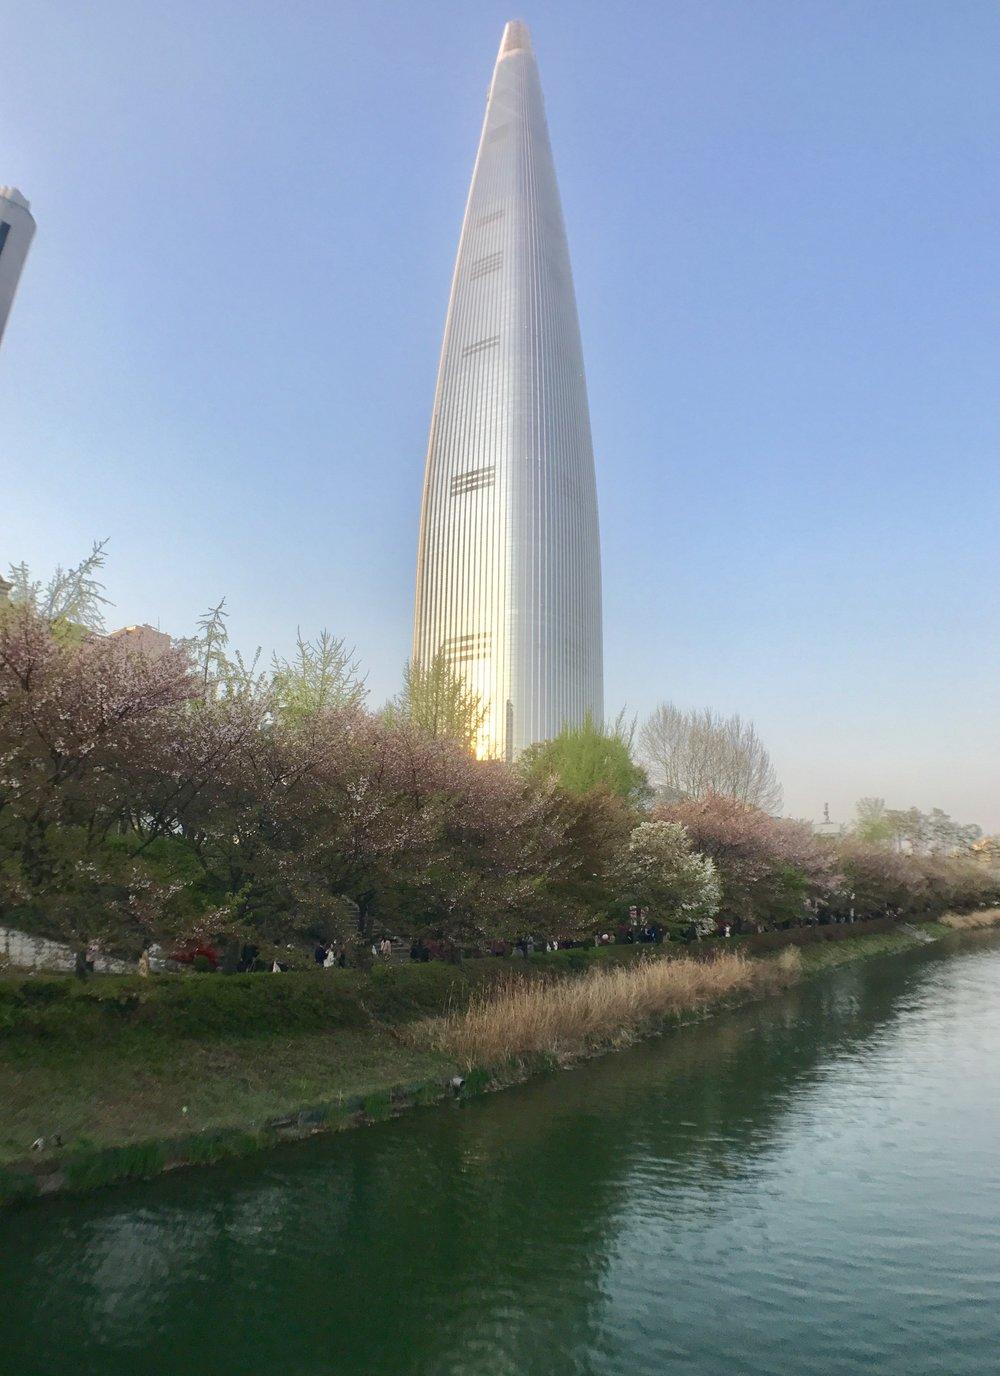 Tallest building in Korea